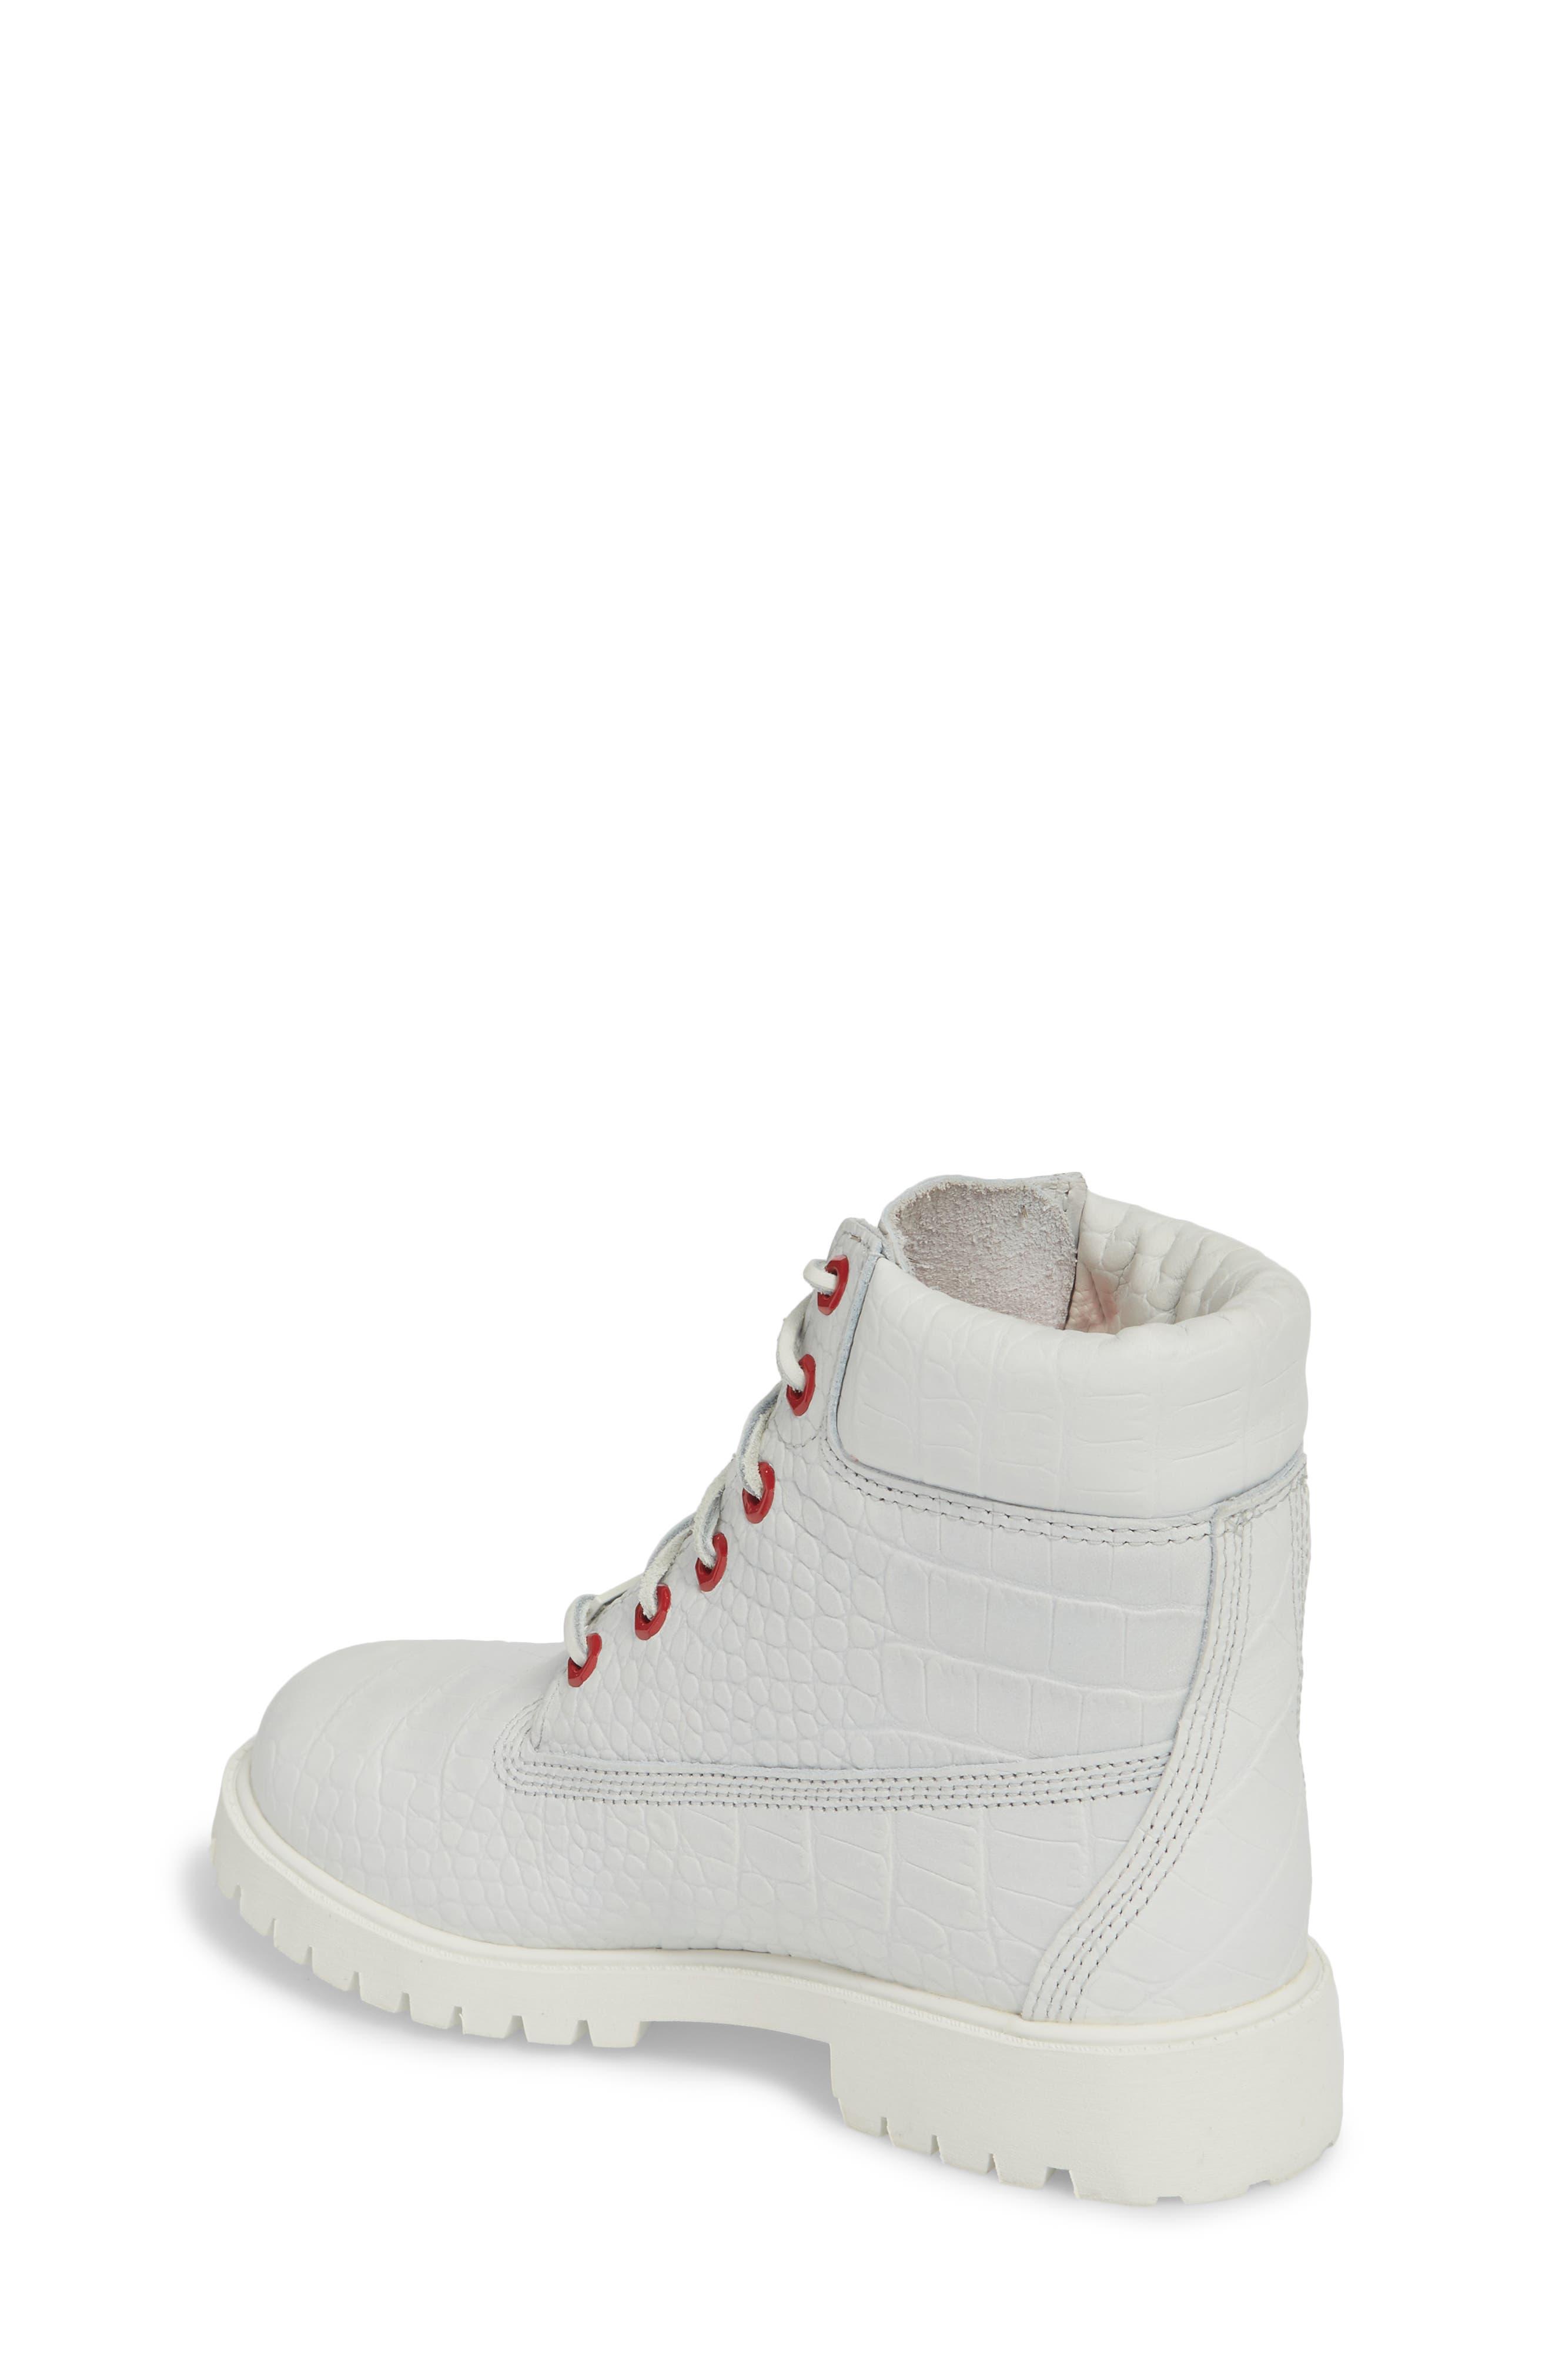 6-Inch Premium Waterproof Boot,                             Alternate thumbnail 2, color,                             White Cardinal Exotic